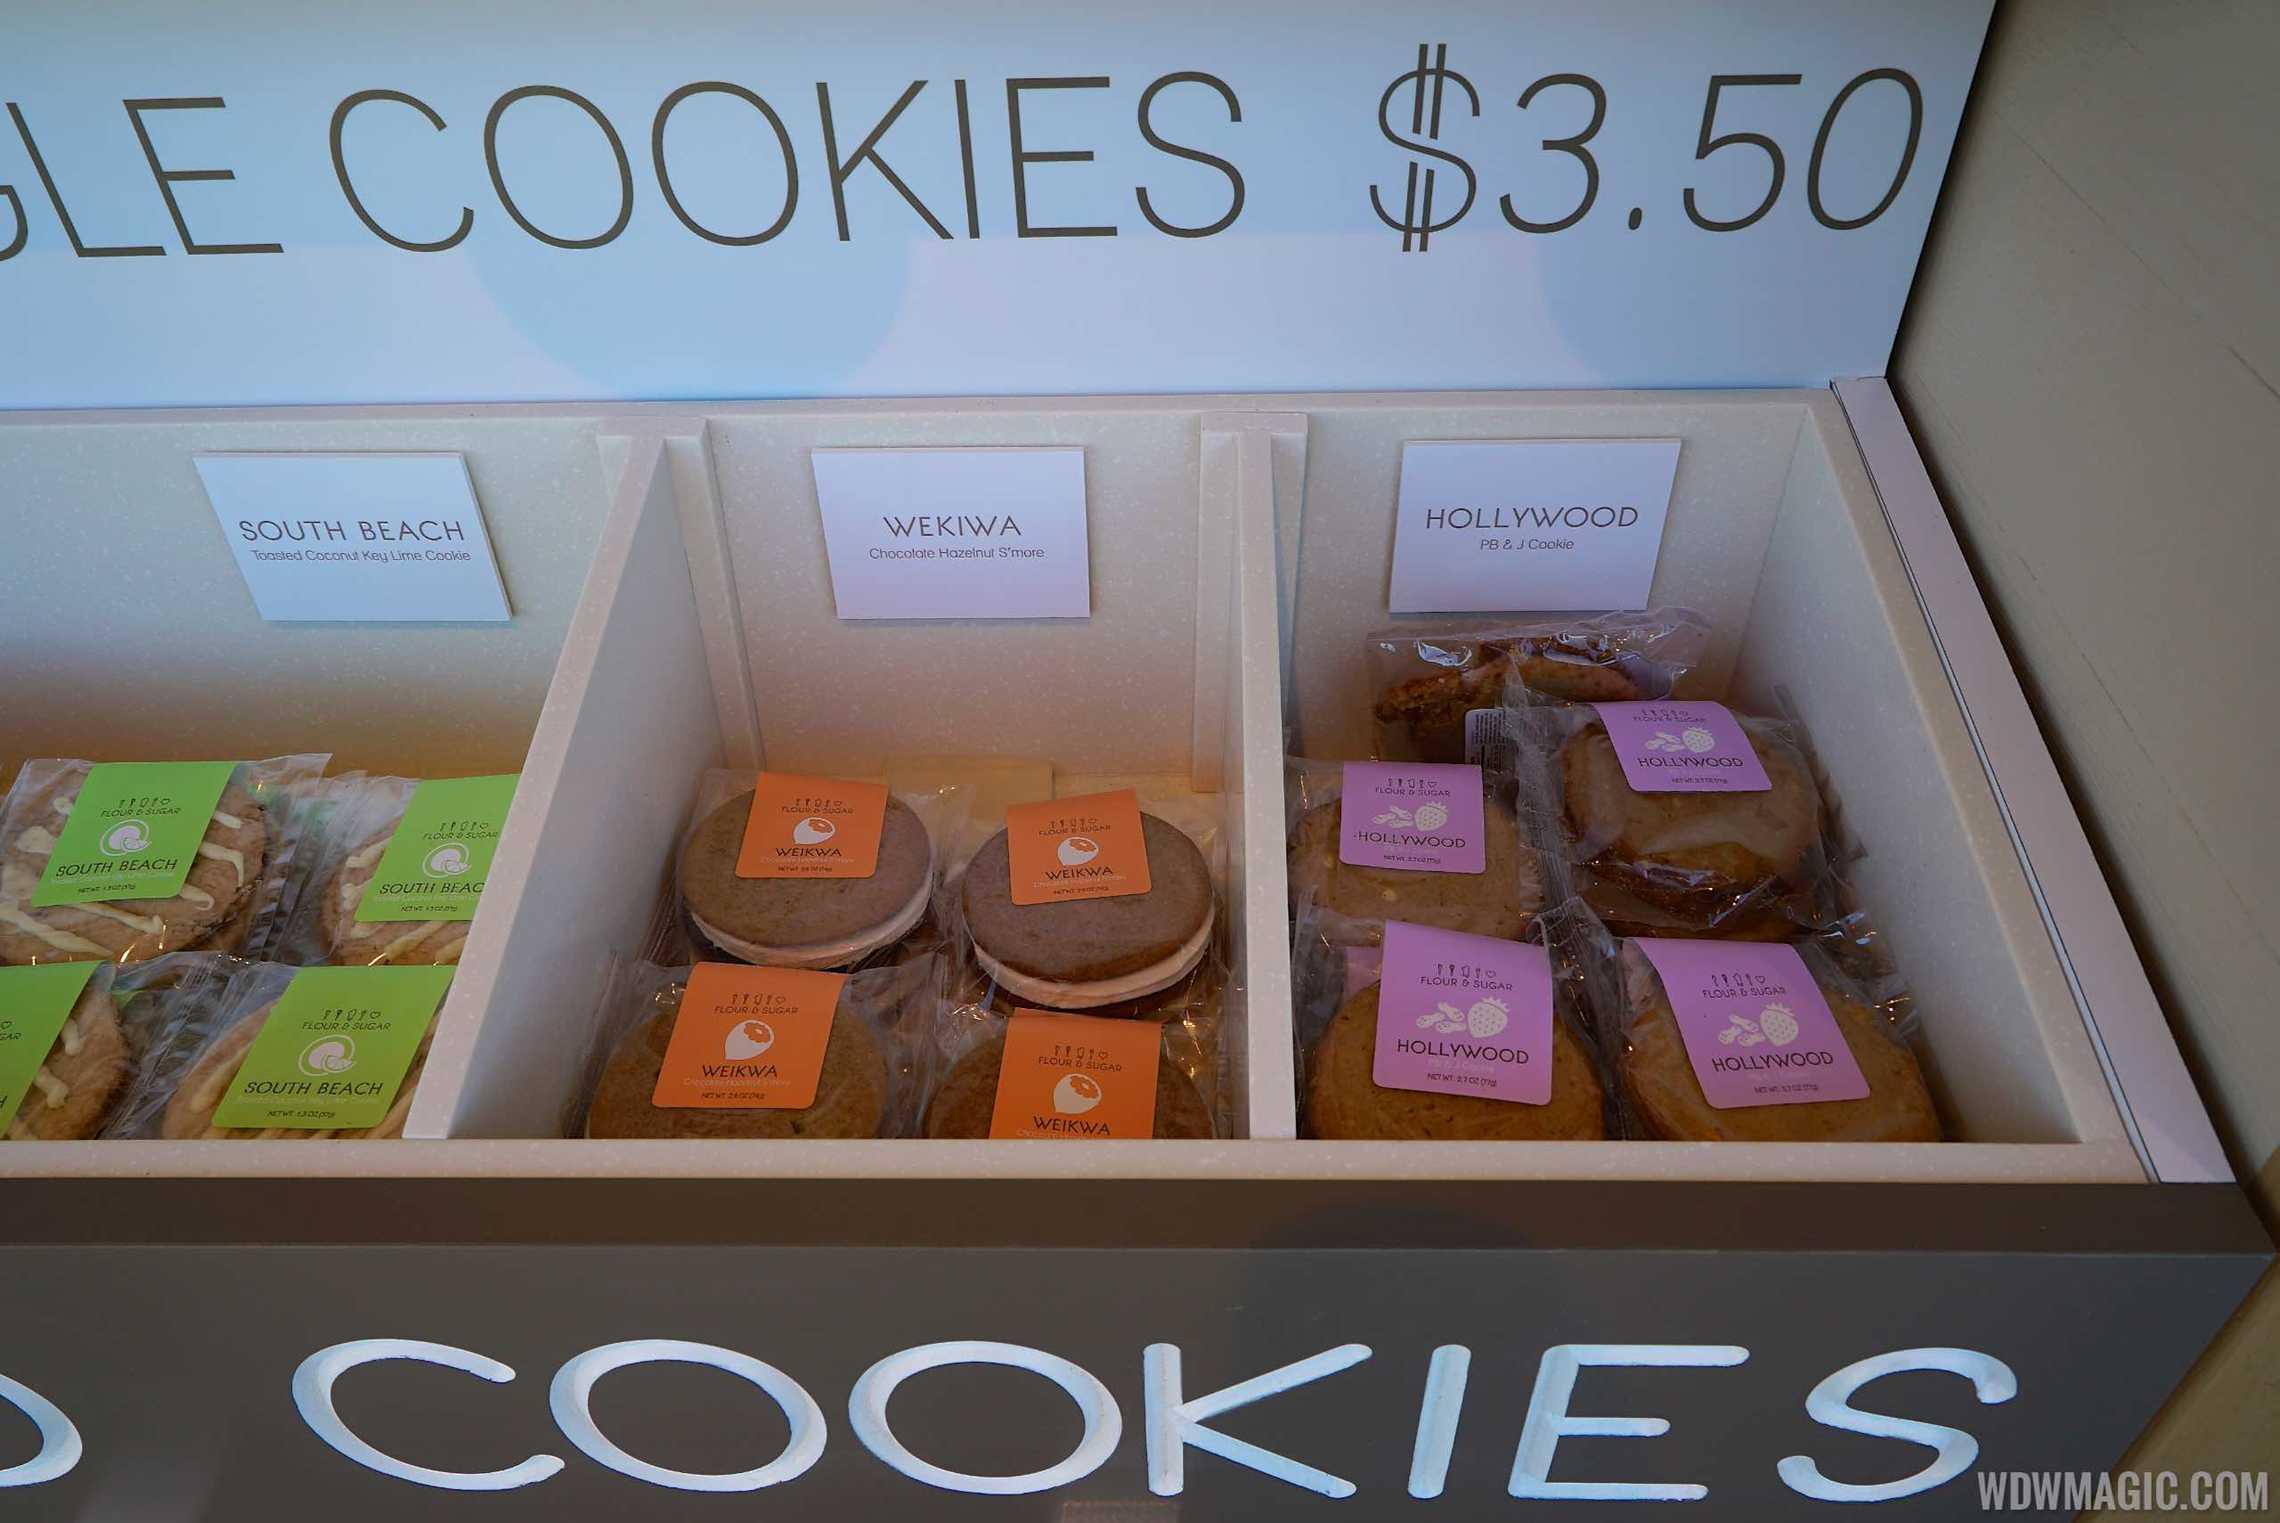 Causeway Kiosk - Flour and Sugar cookies